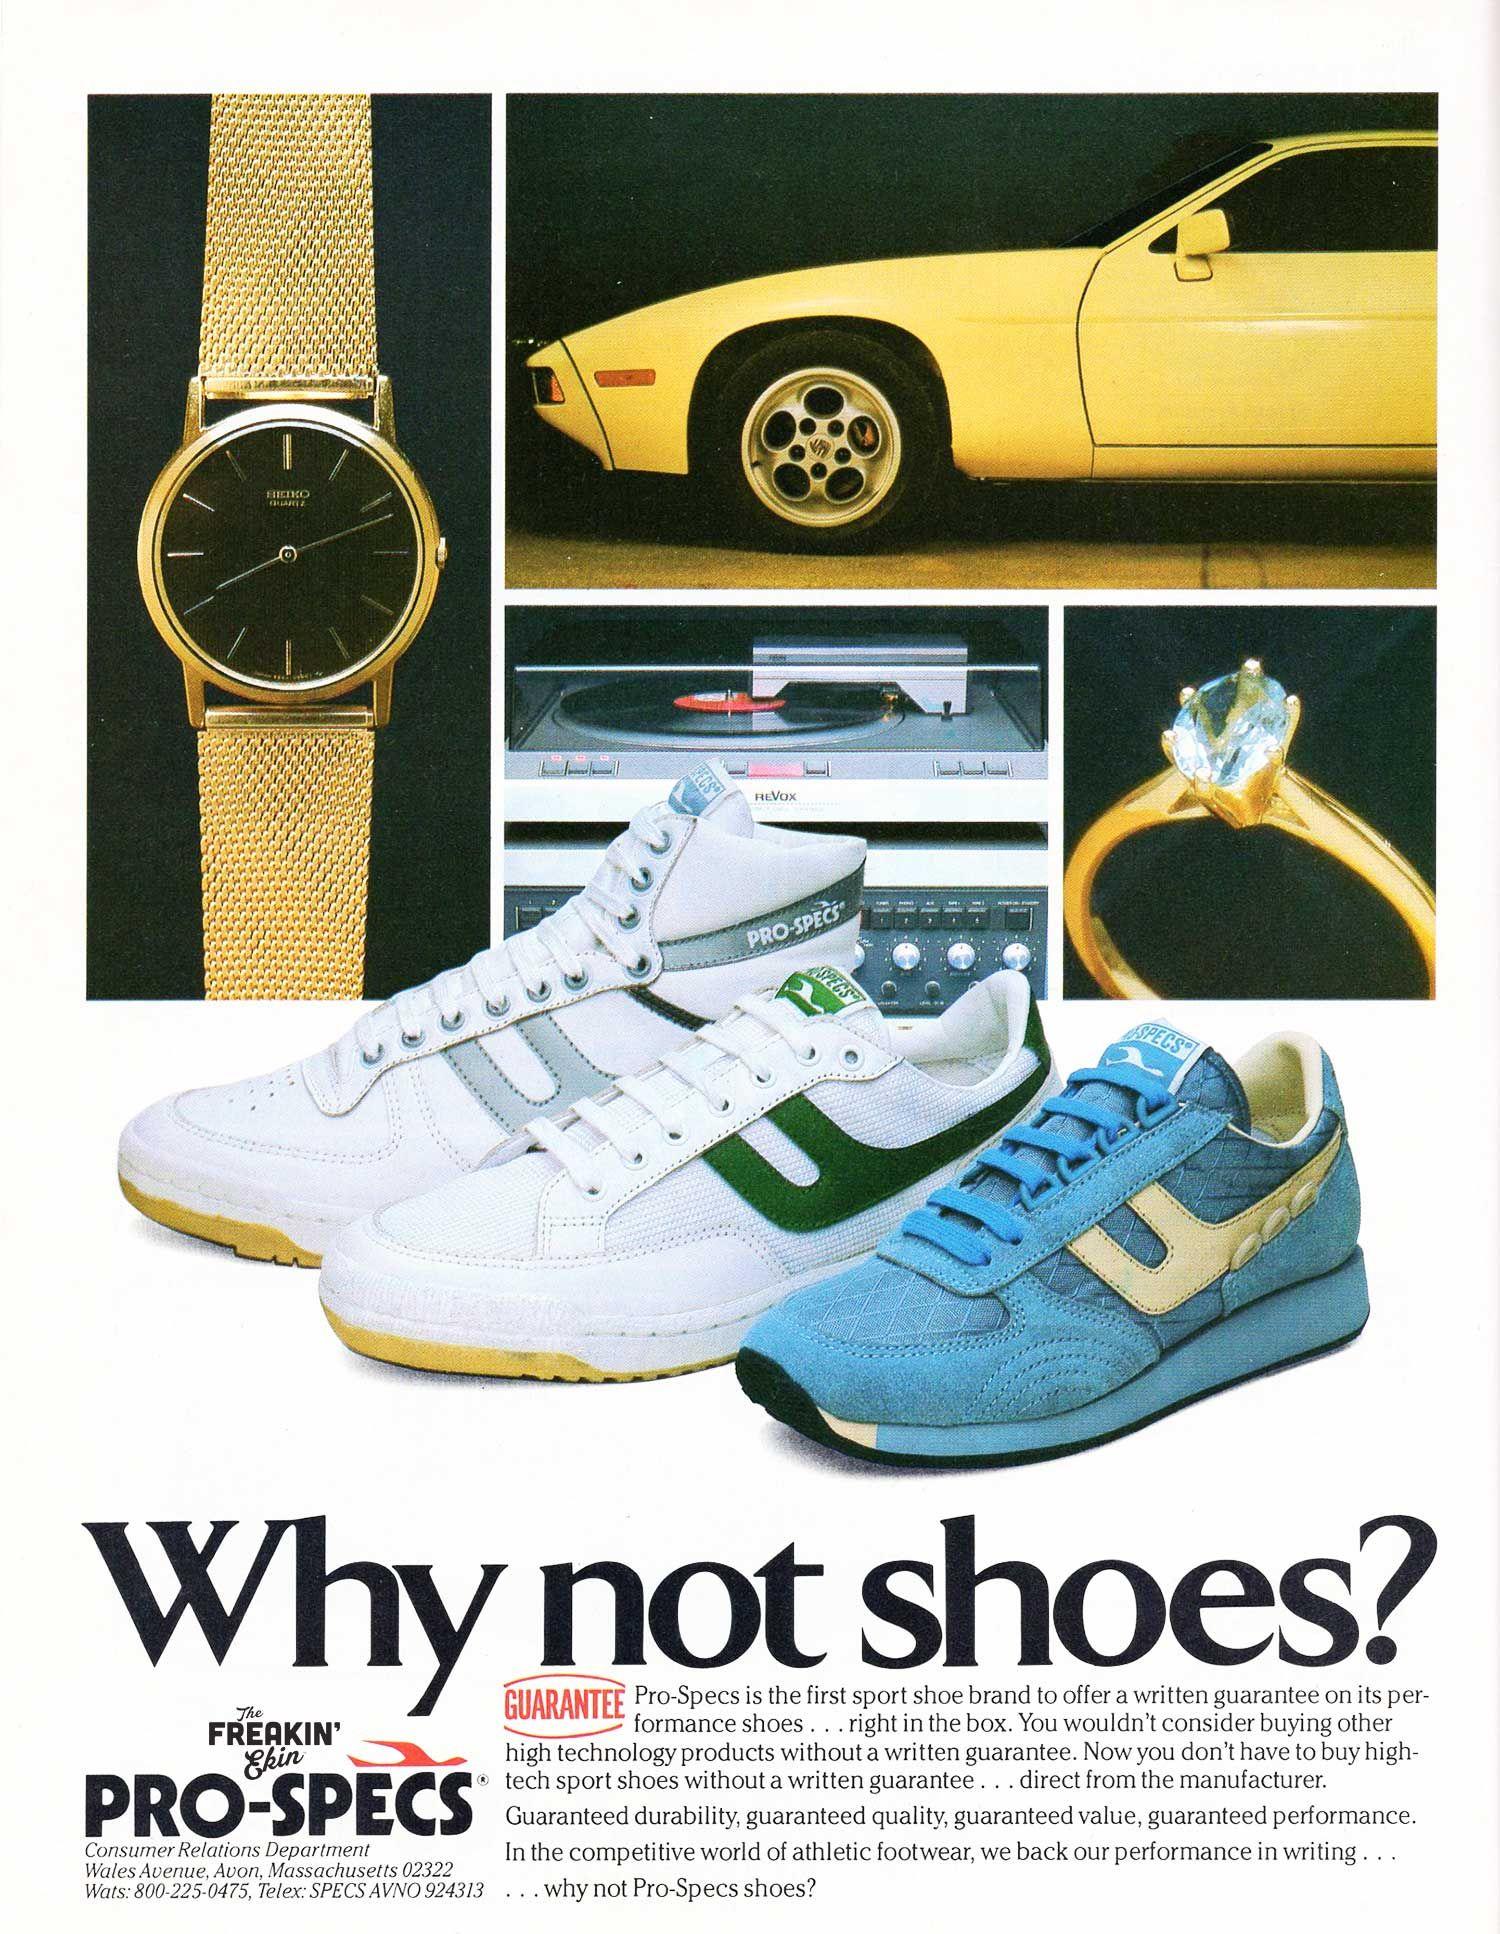 Vintage Sneaks Sighting: 1970 Bata brand John Wooden